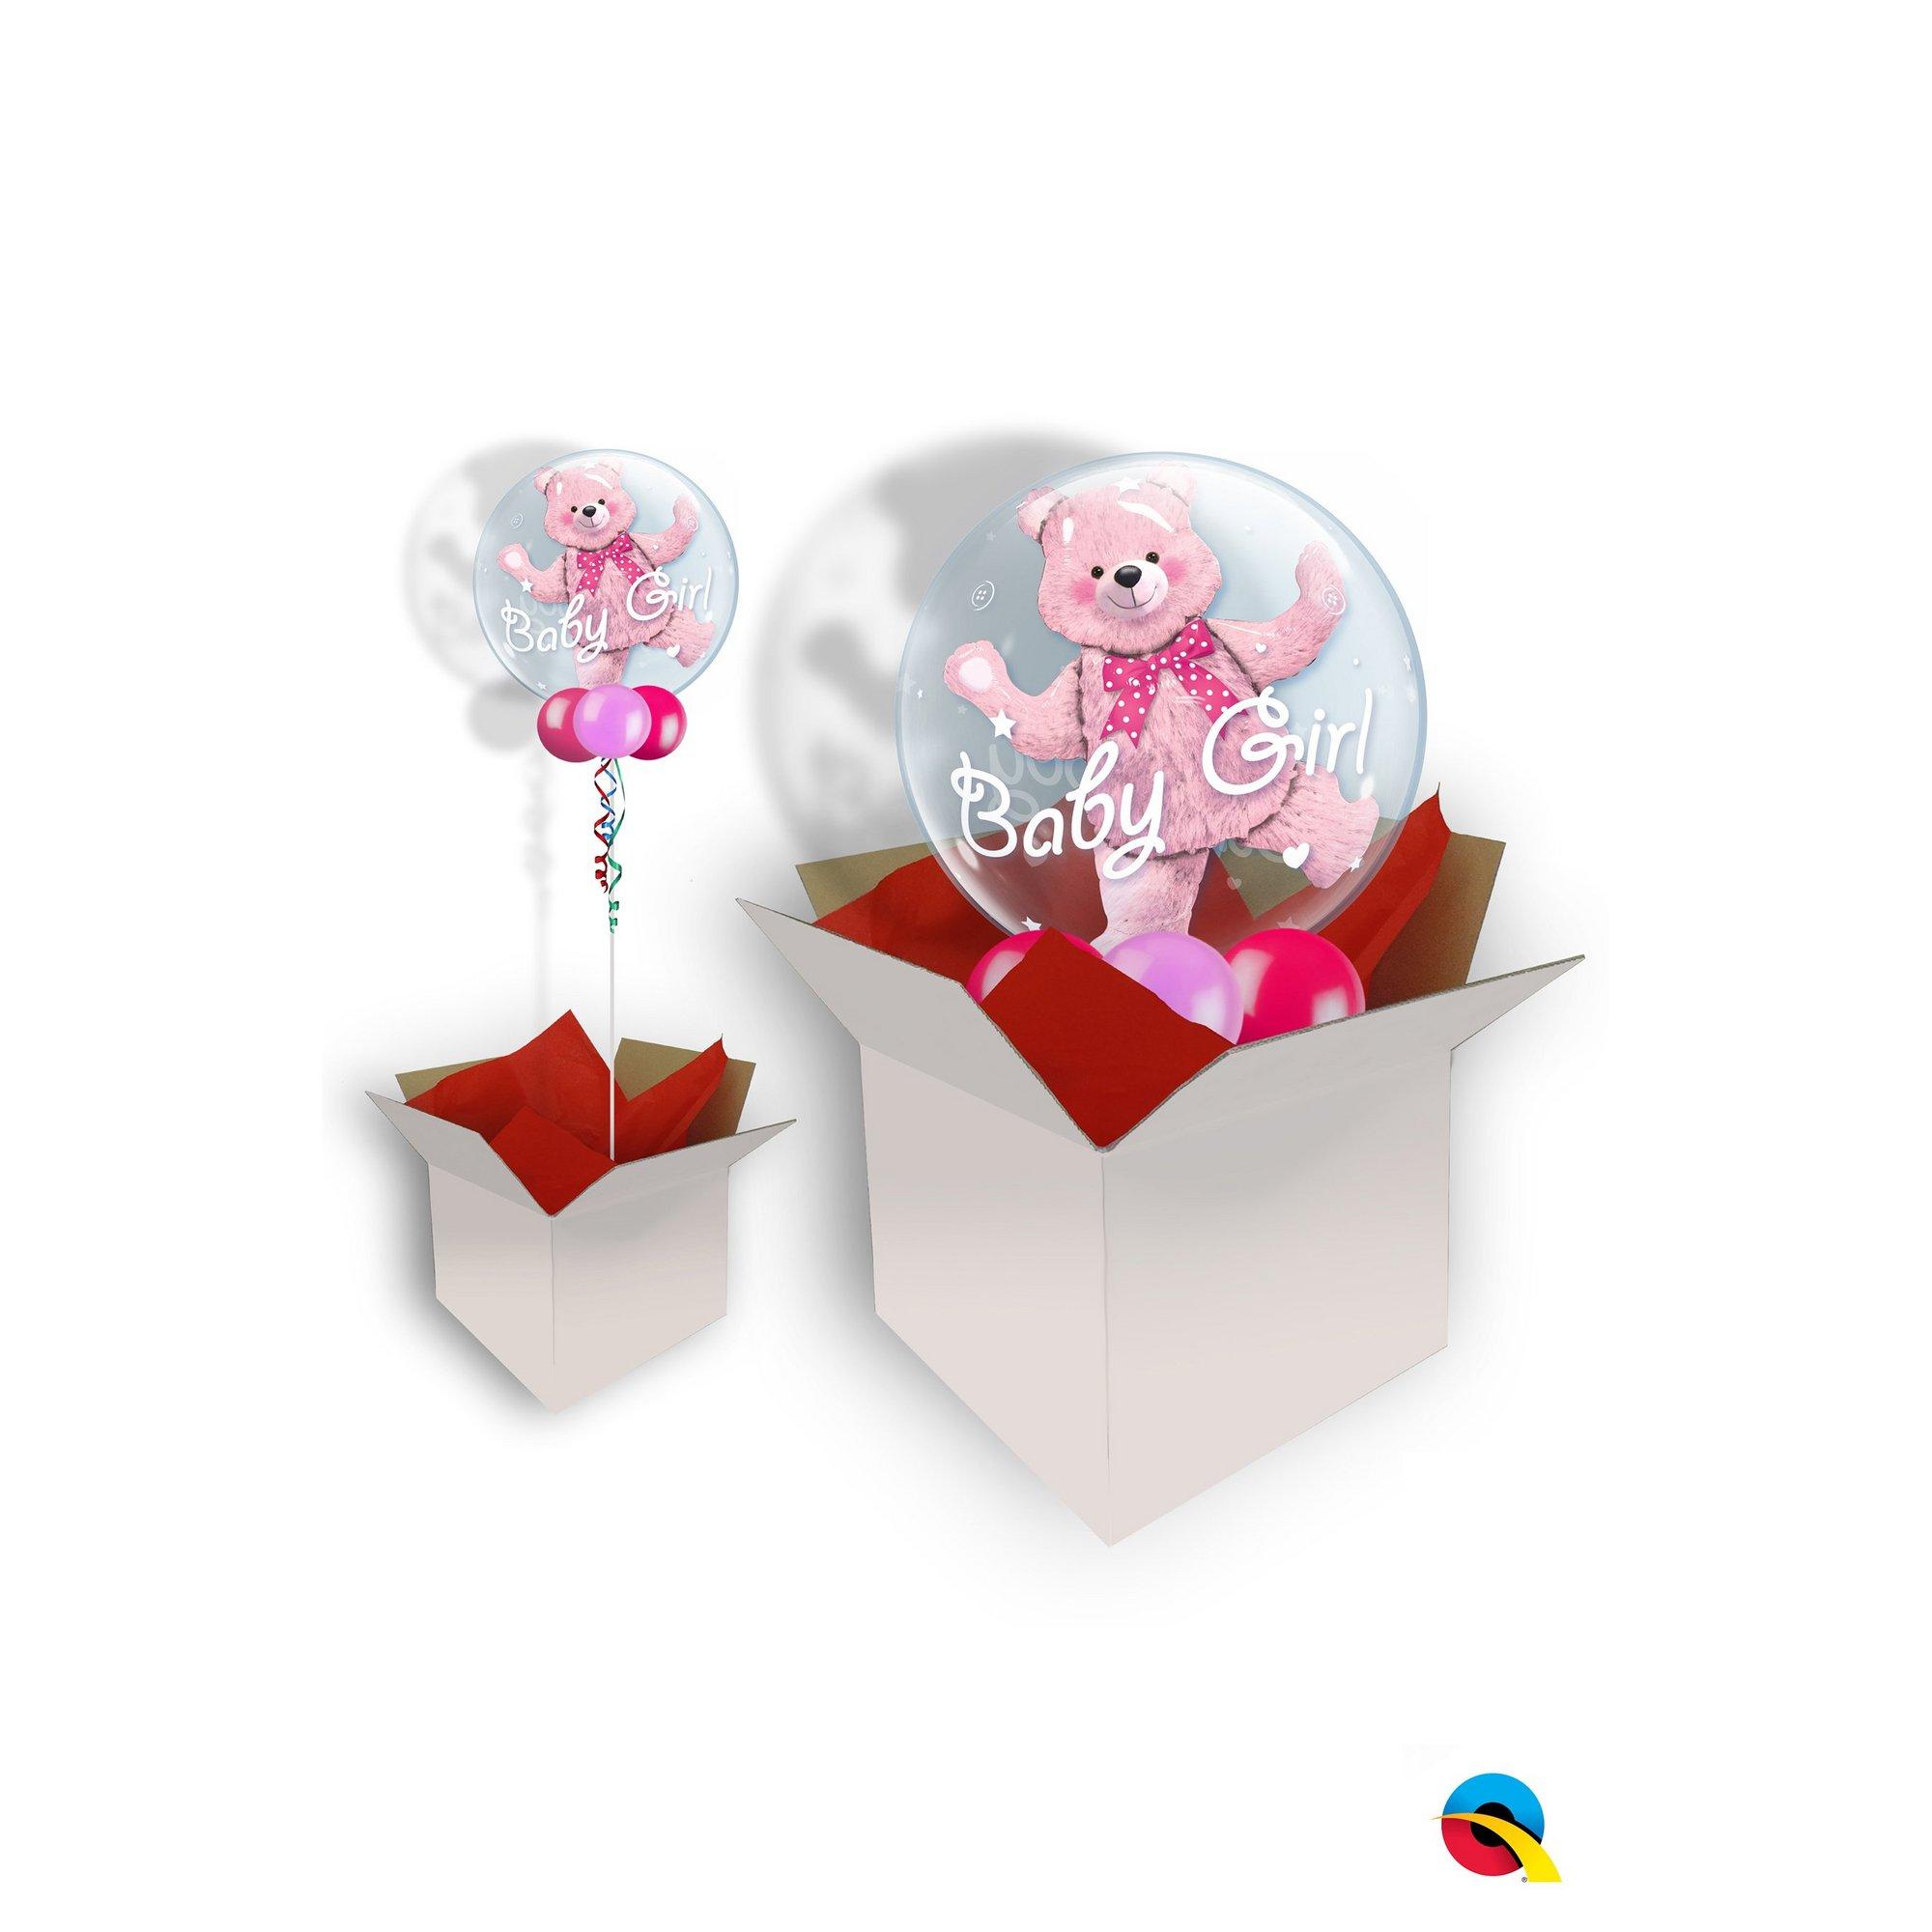 Image of Baby Girl Bear Double Bubble Balloon